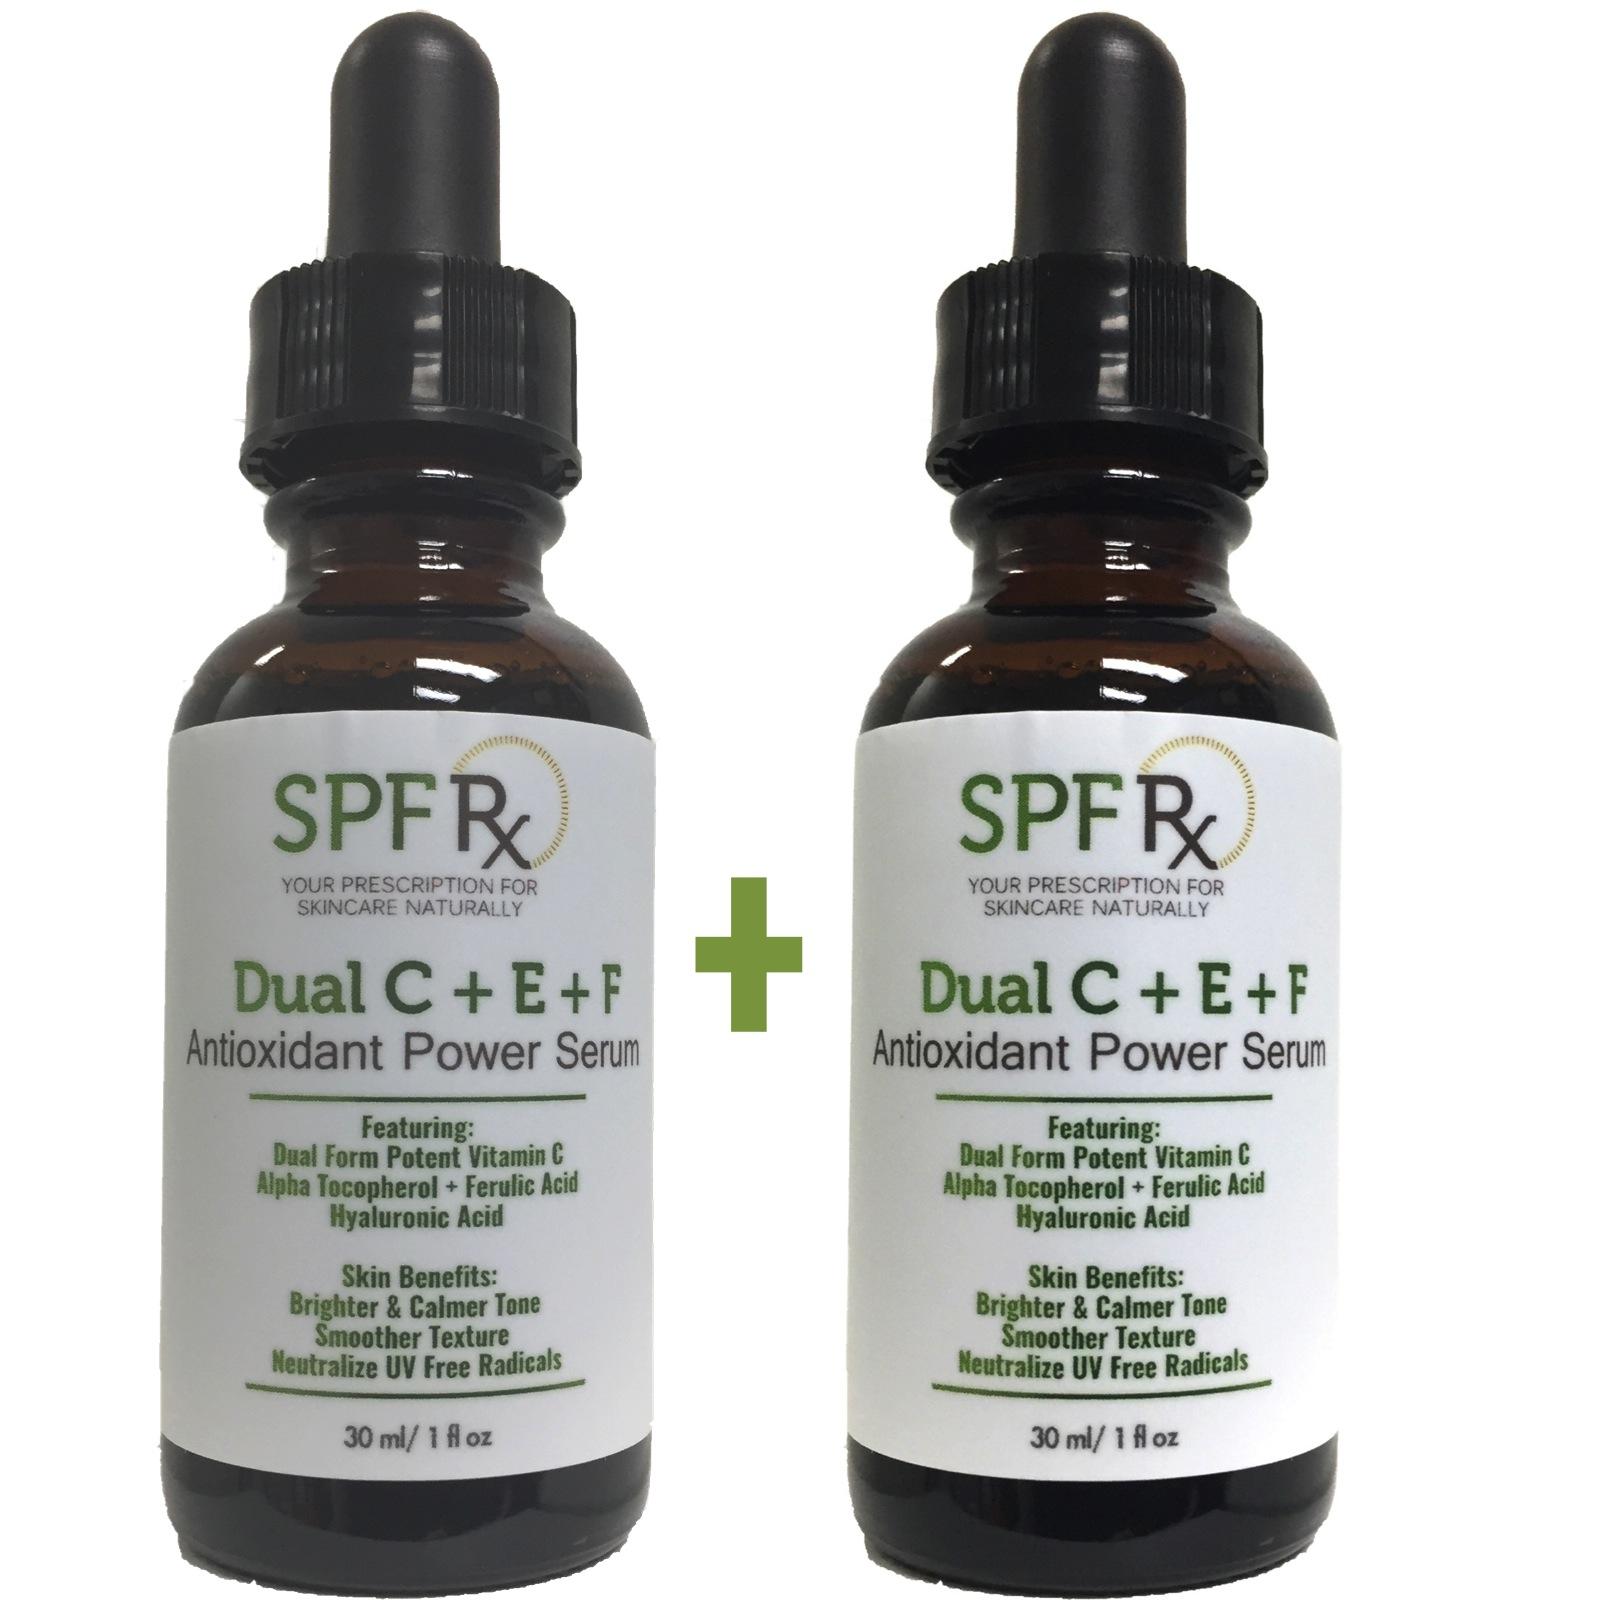 SPF Rx Dual C E Ferulic Acid Serum, an Antioxidant Power ...